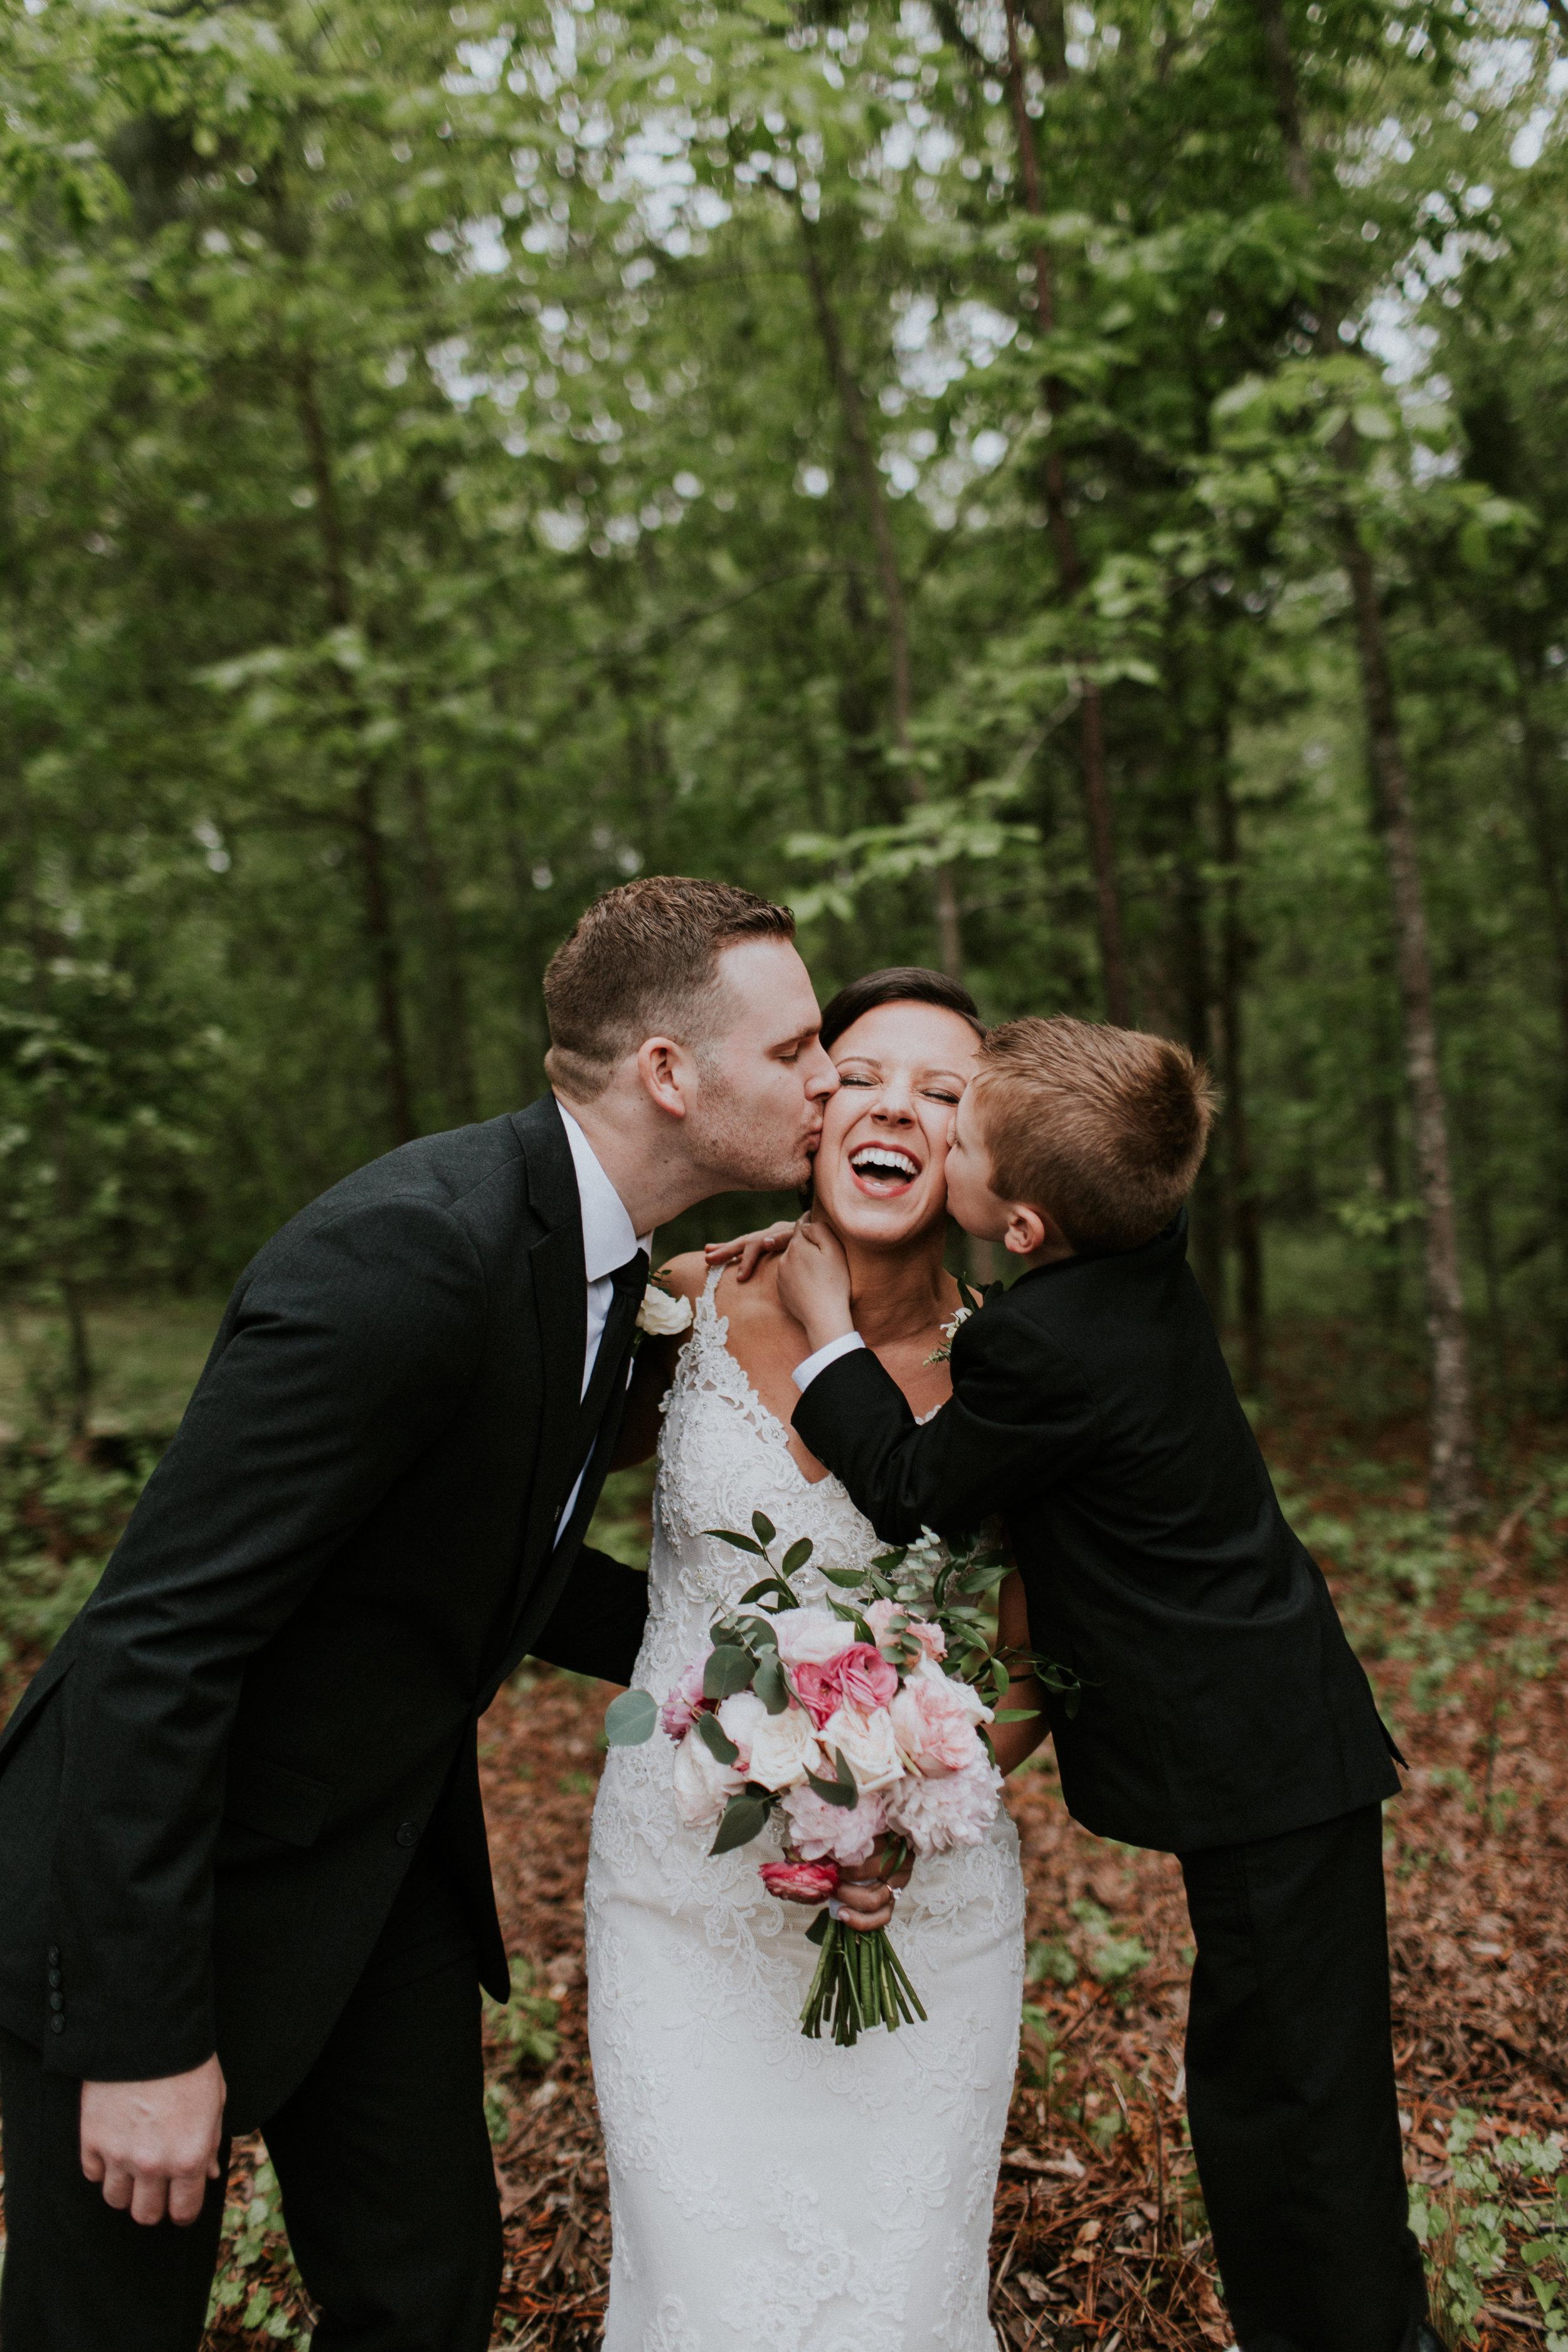 Christian_Reyes_Photography_Triad_NC_Wedding_Photographer-206.jpg